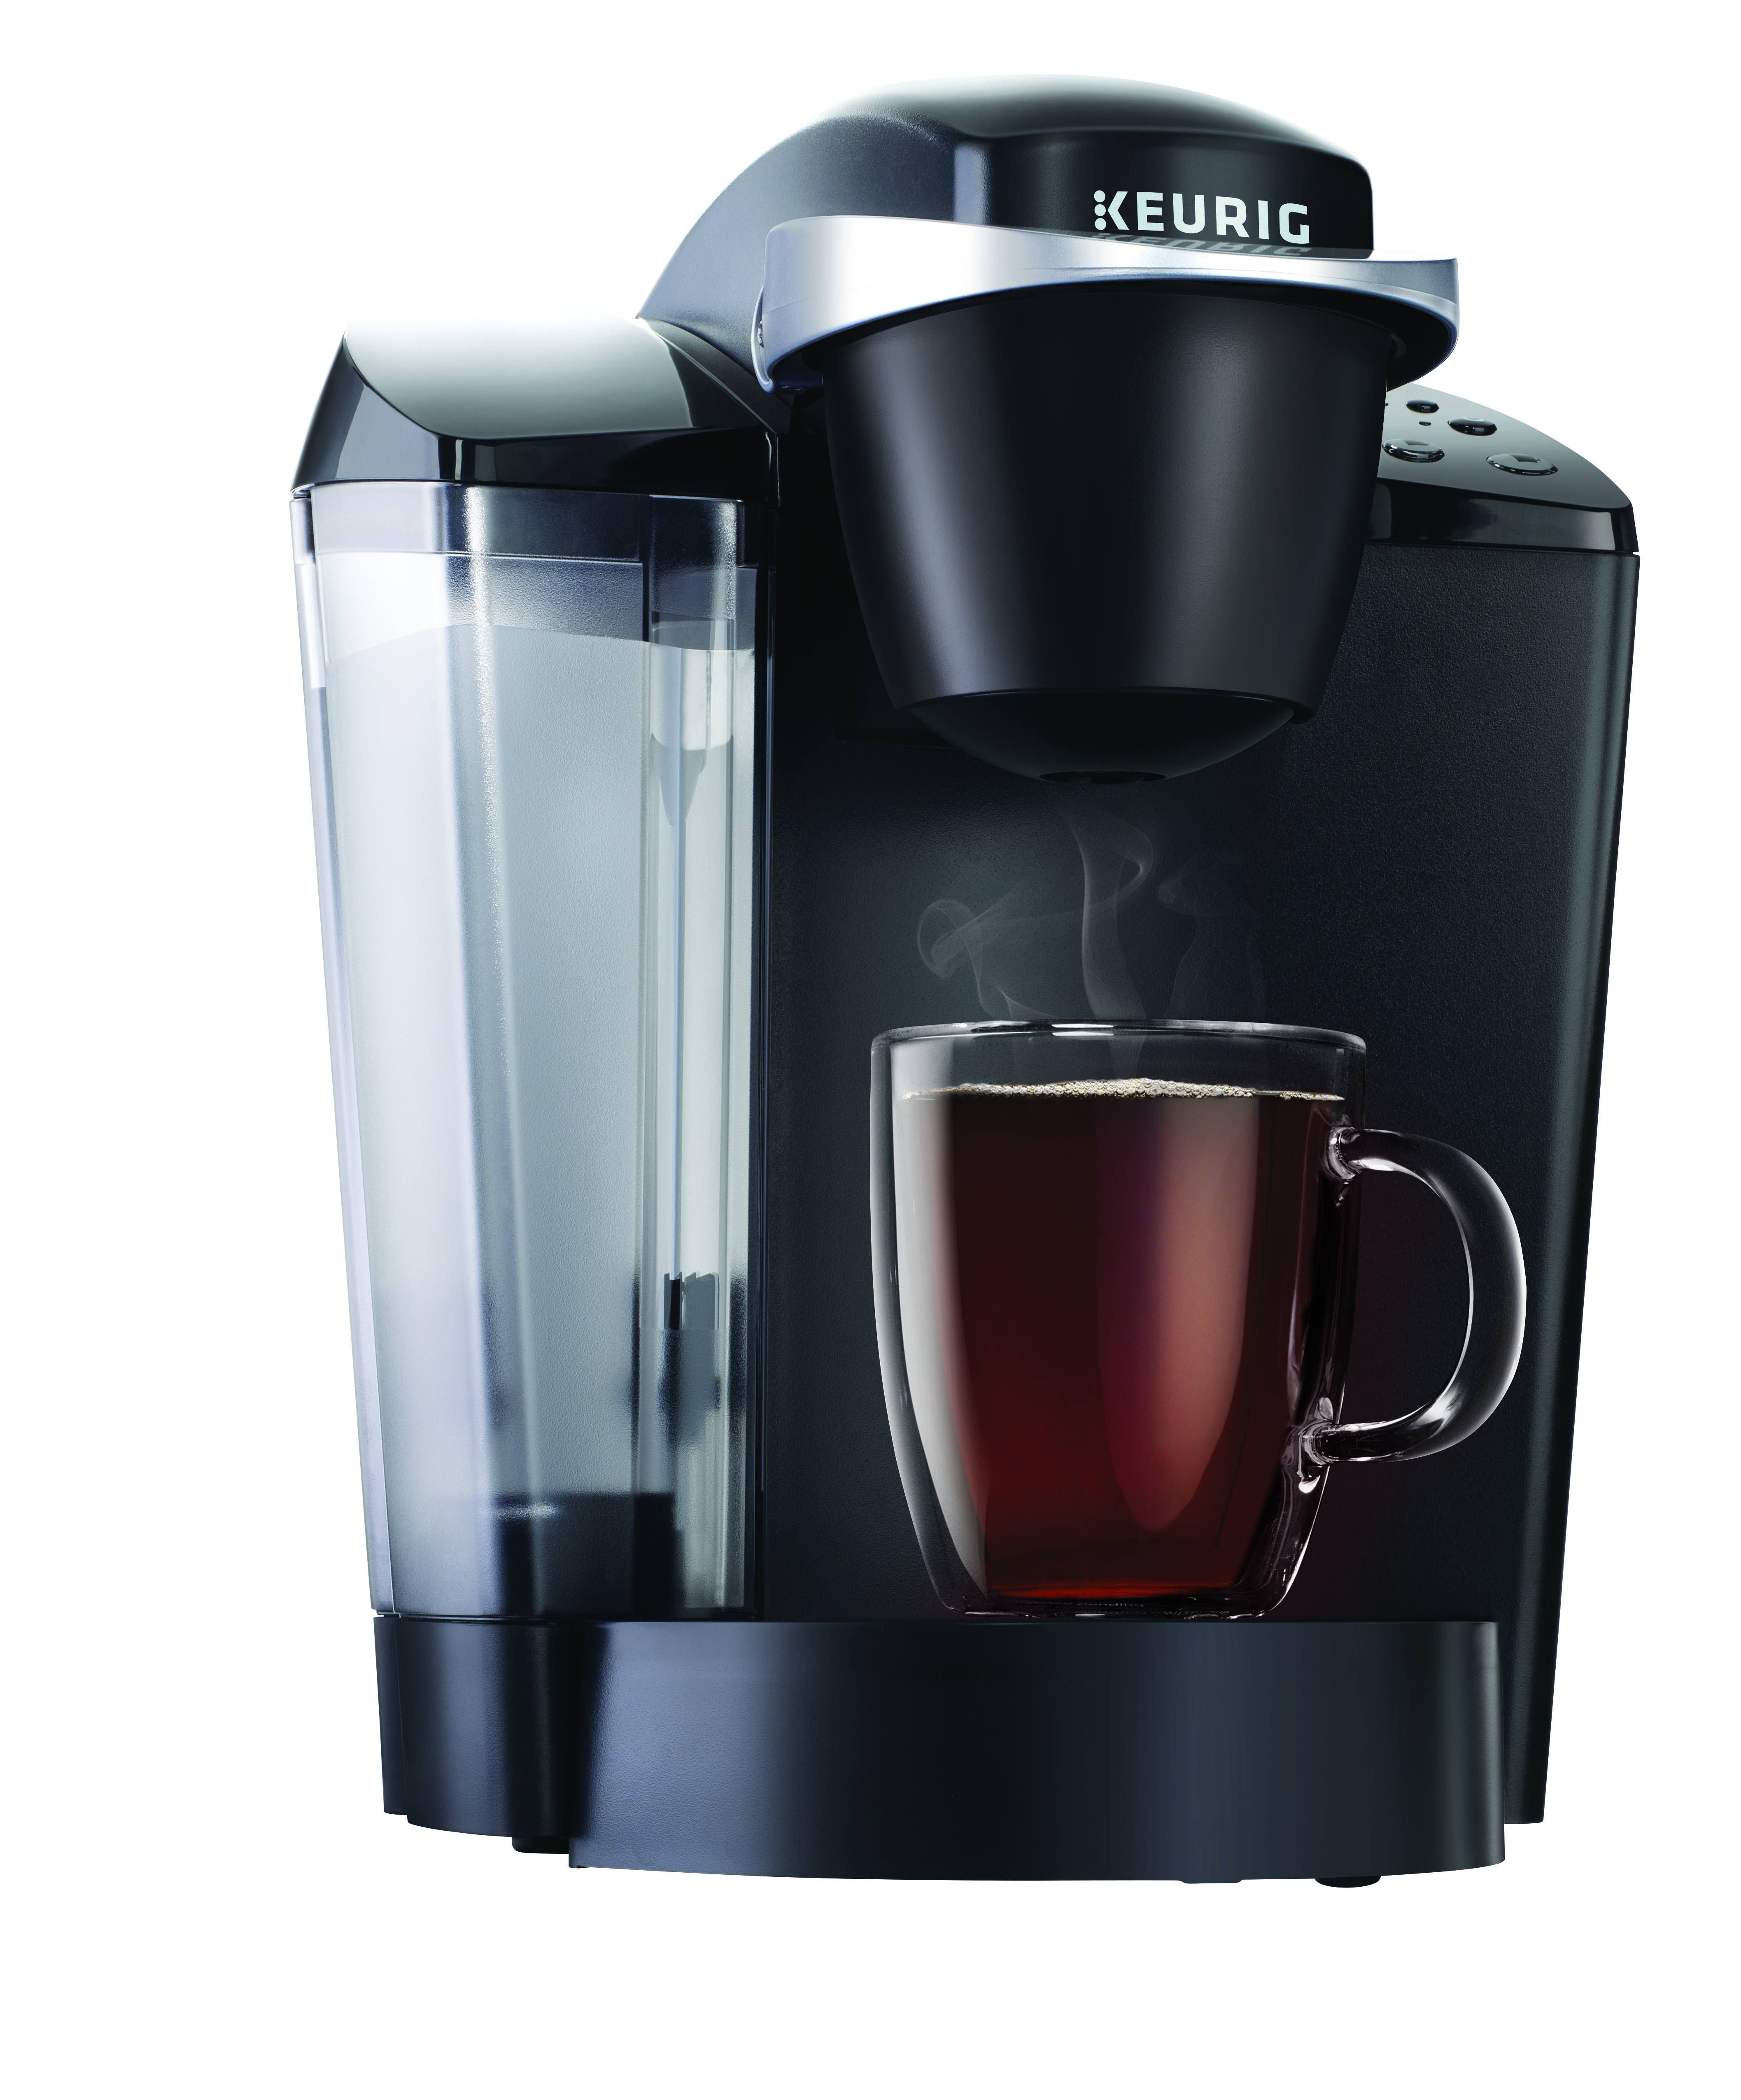 Keurig K425 Single Serve Black K Cup Pod Coffee Maker Walmart Com Camping Coffee Maker Keurig Coffee Makers Single Serve Coffee Makers